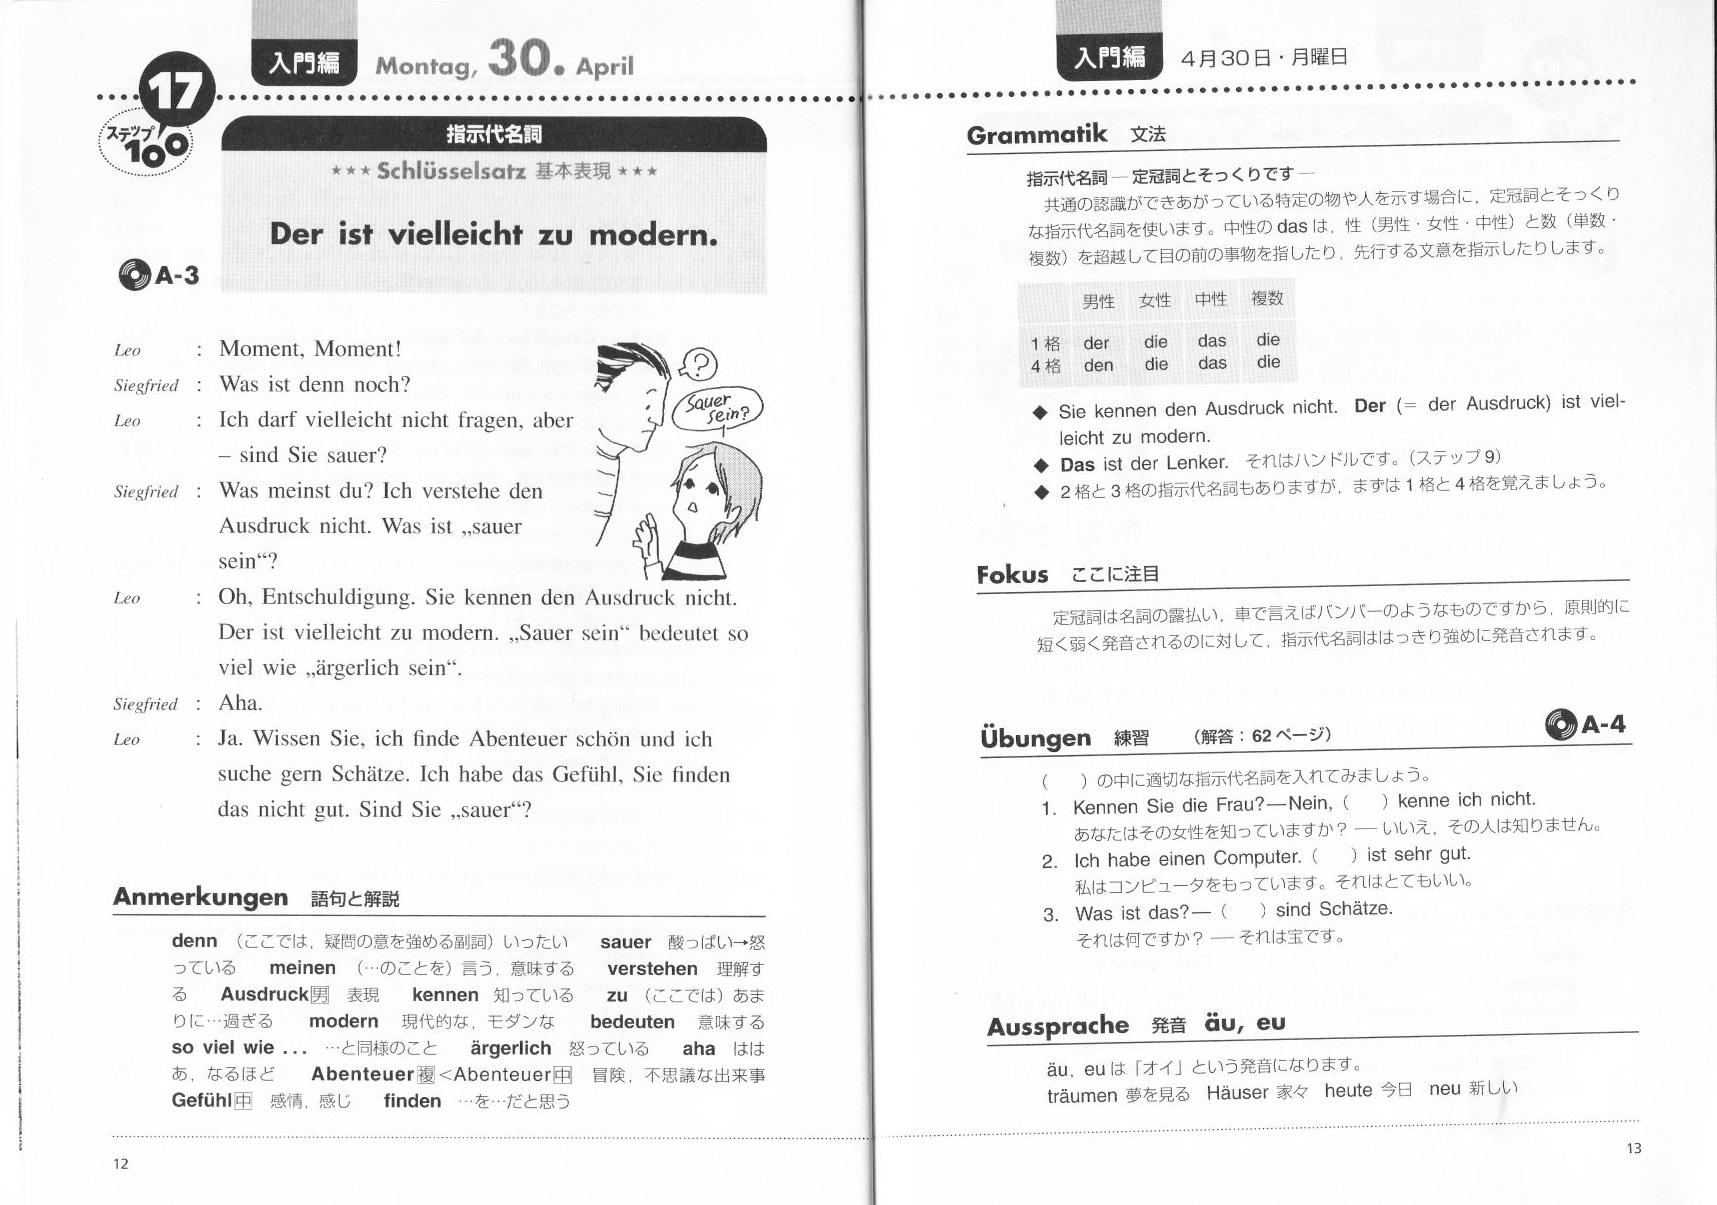 NHK語学テキストは教科書か、参考書か?(15年12月31日)_c0059093_1429680.jpg